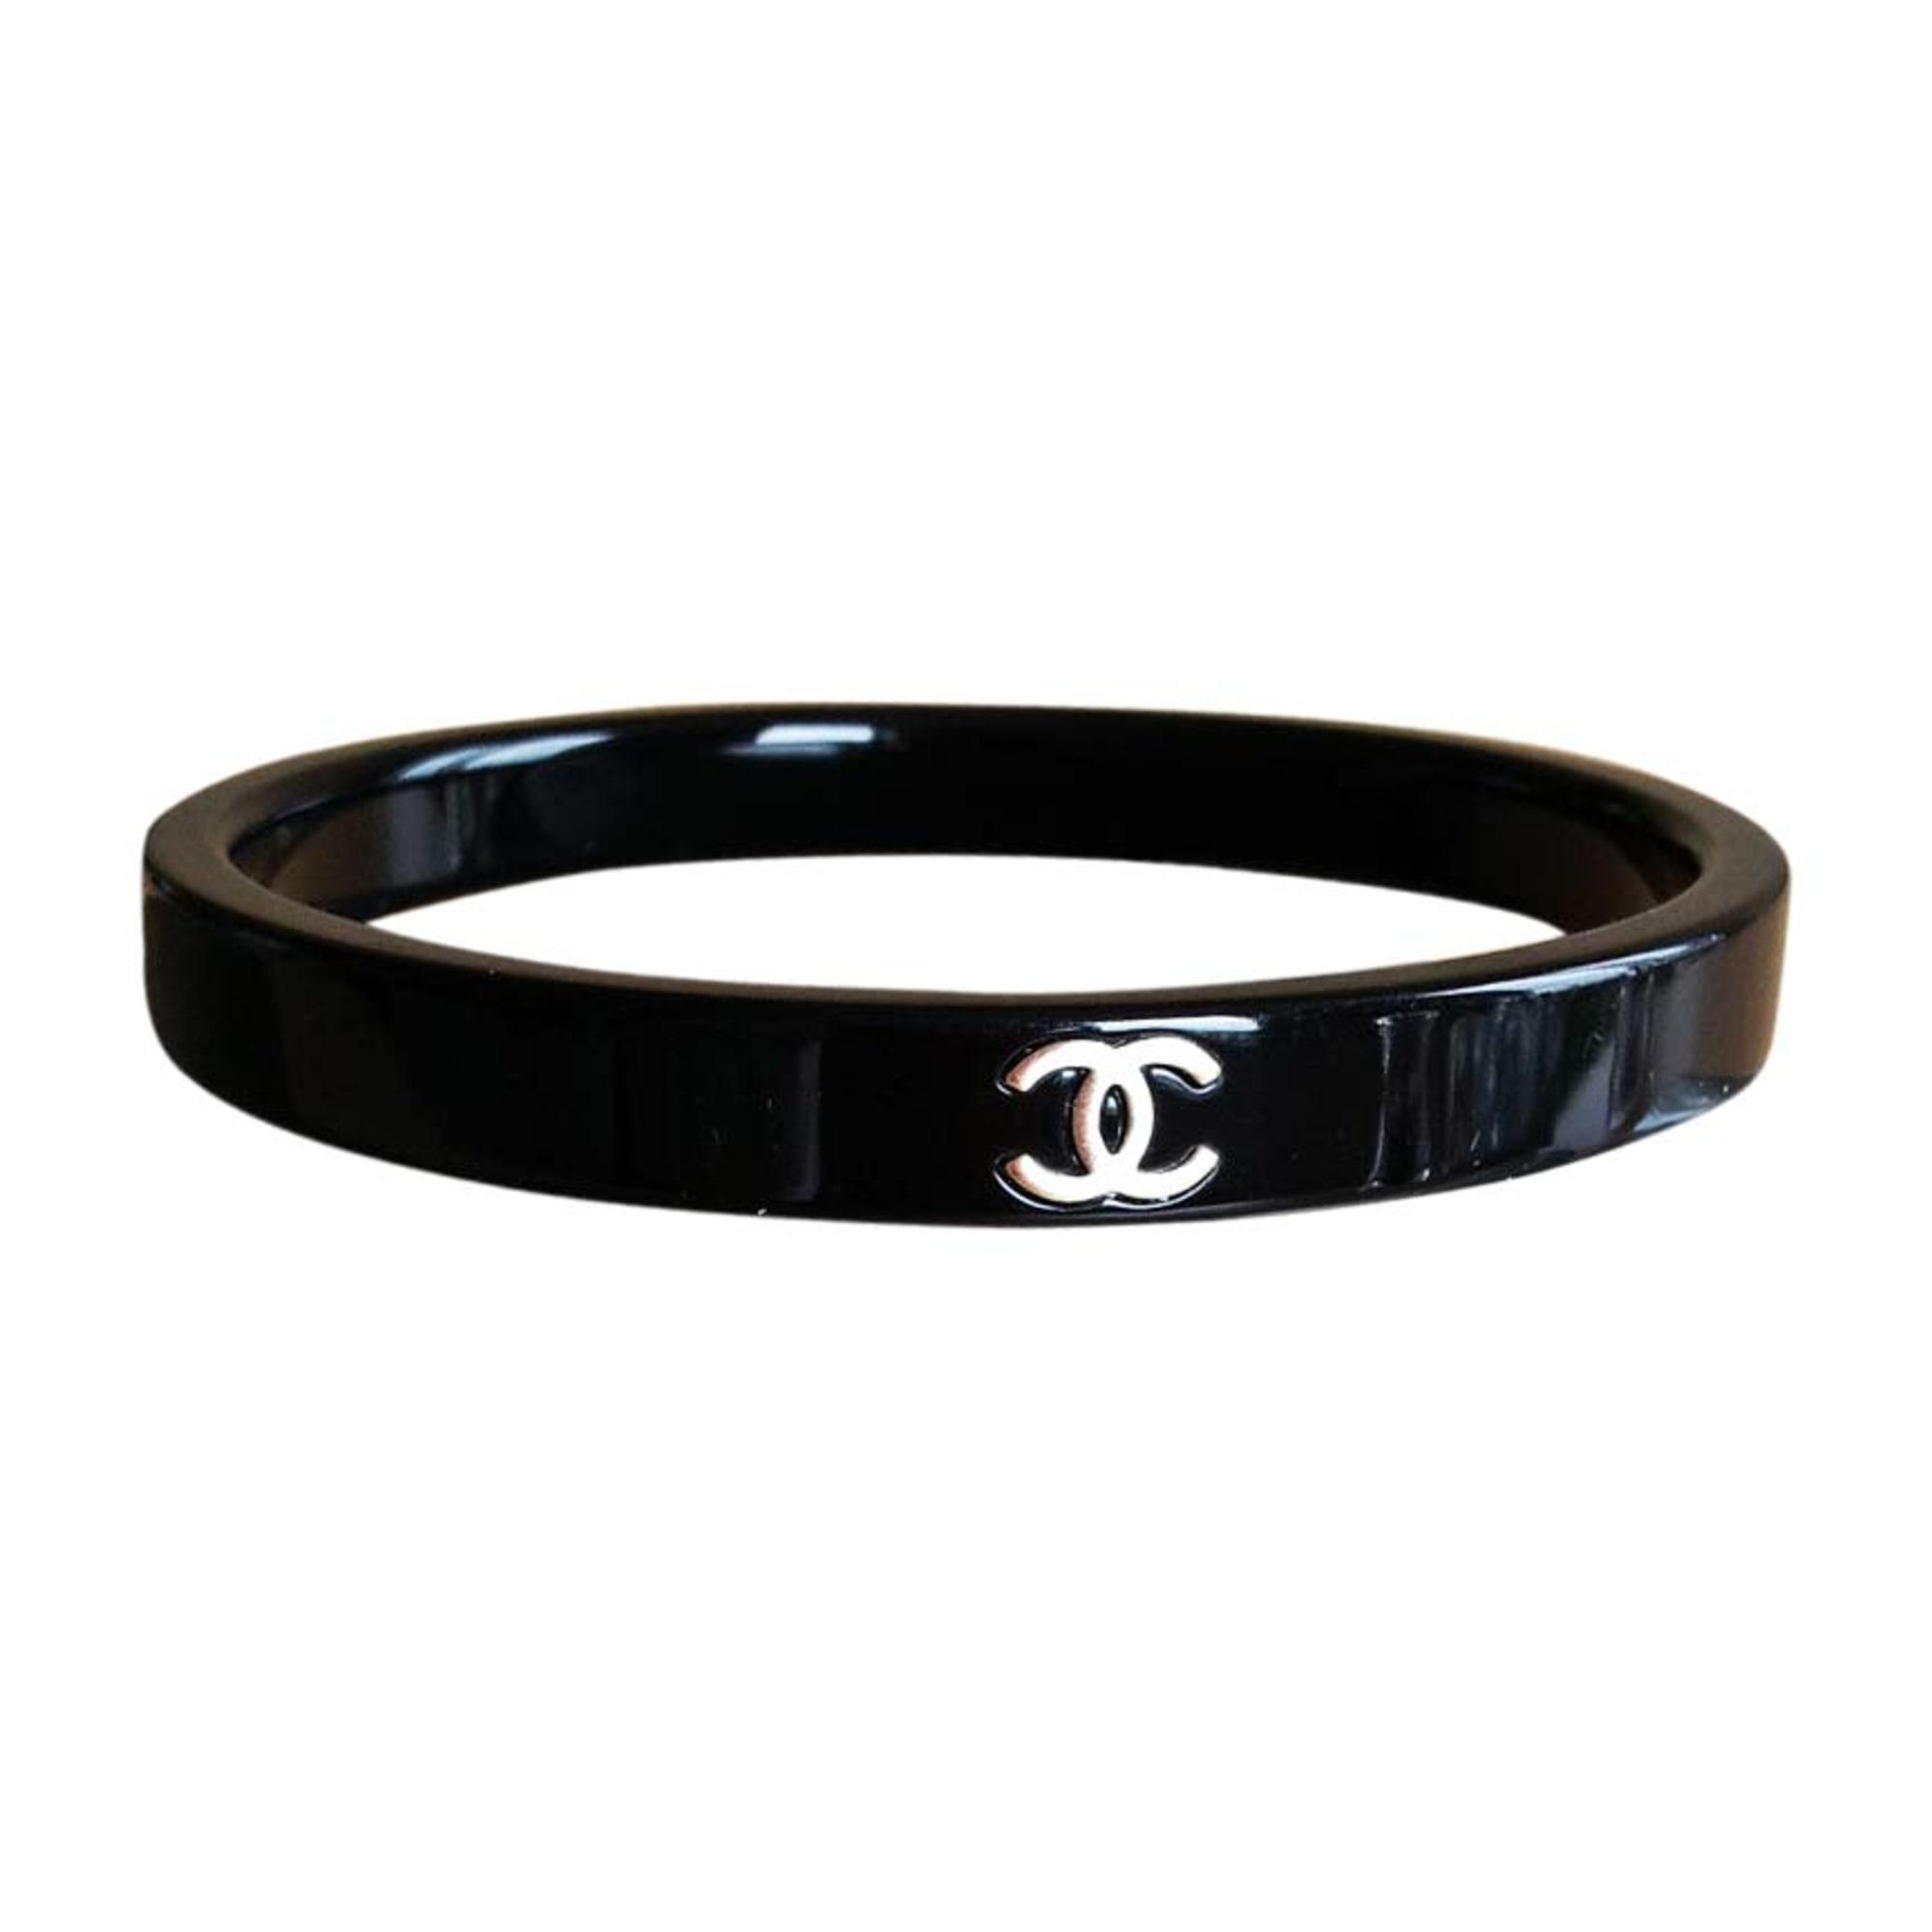 Bracelet homme the kooples